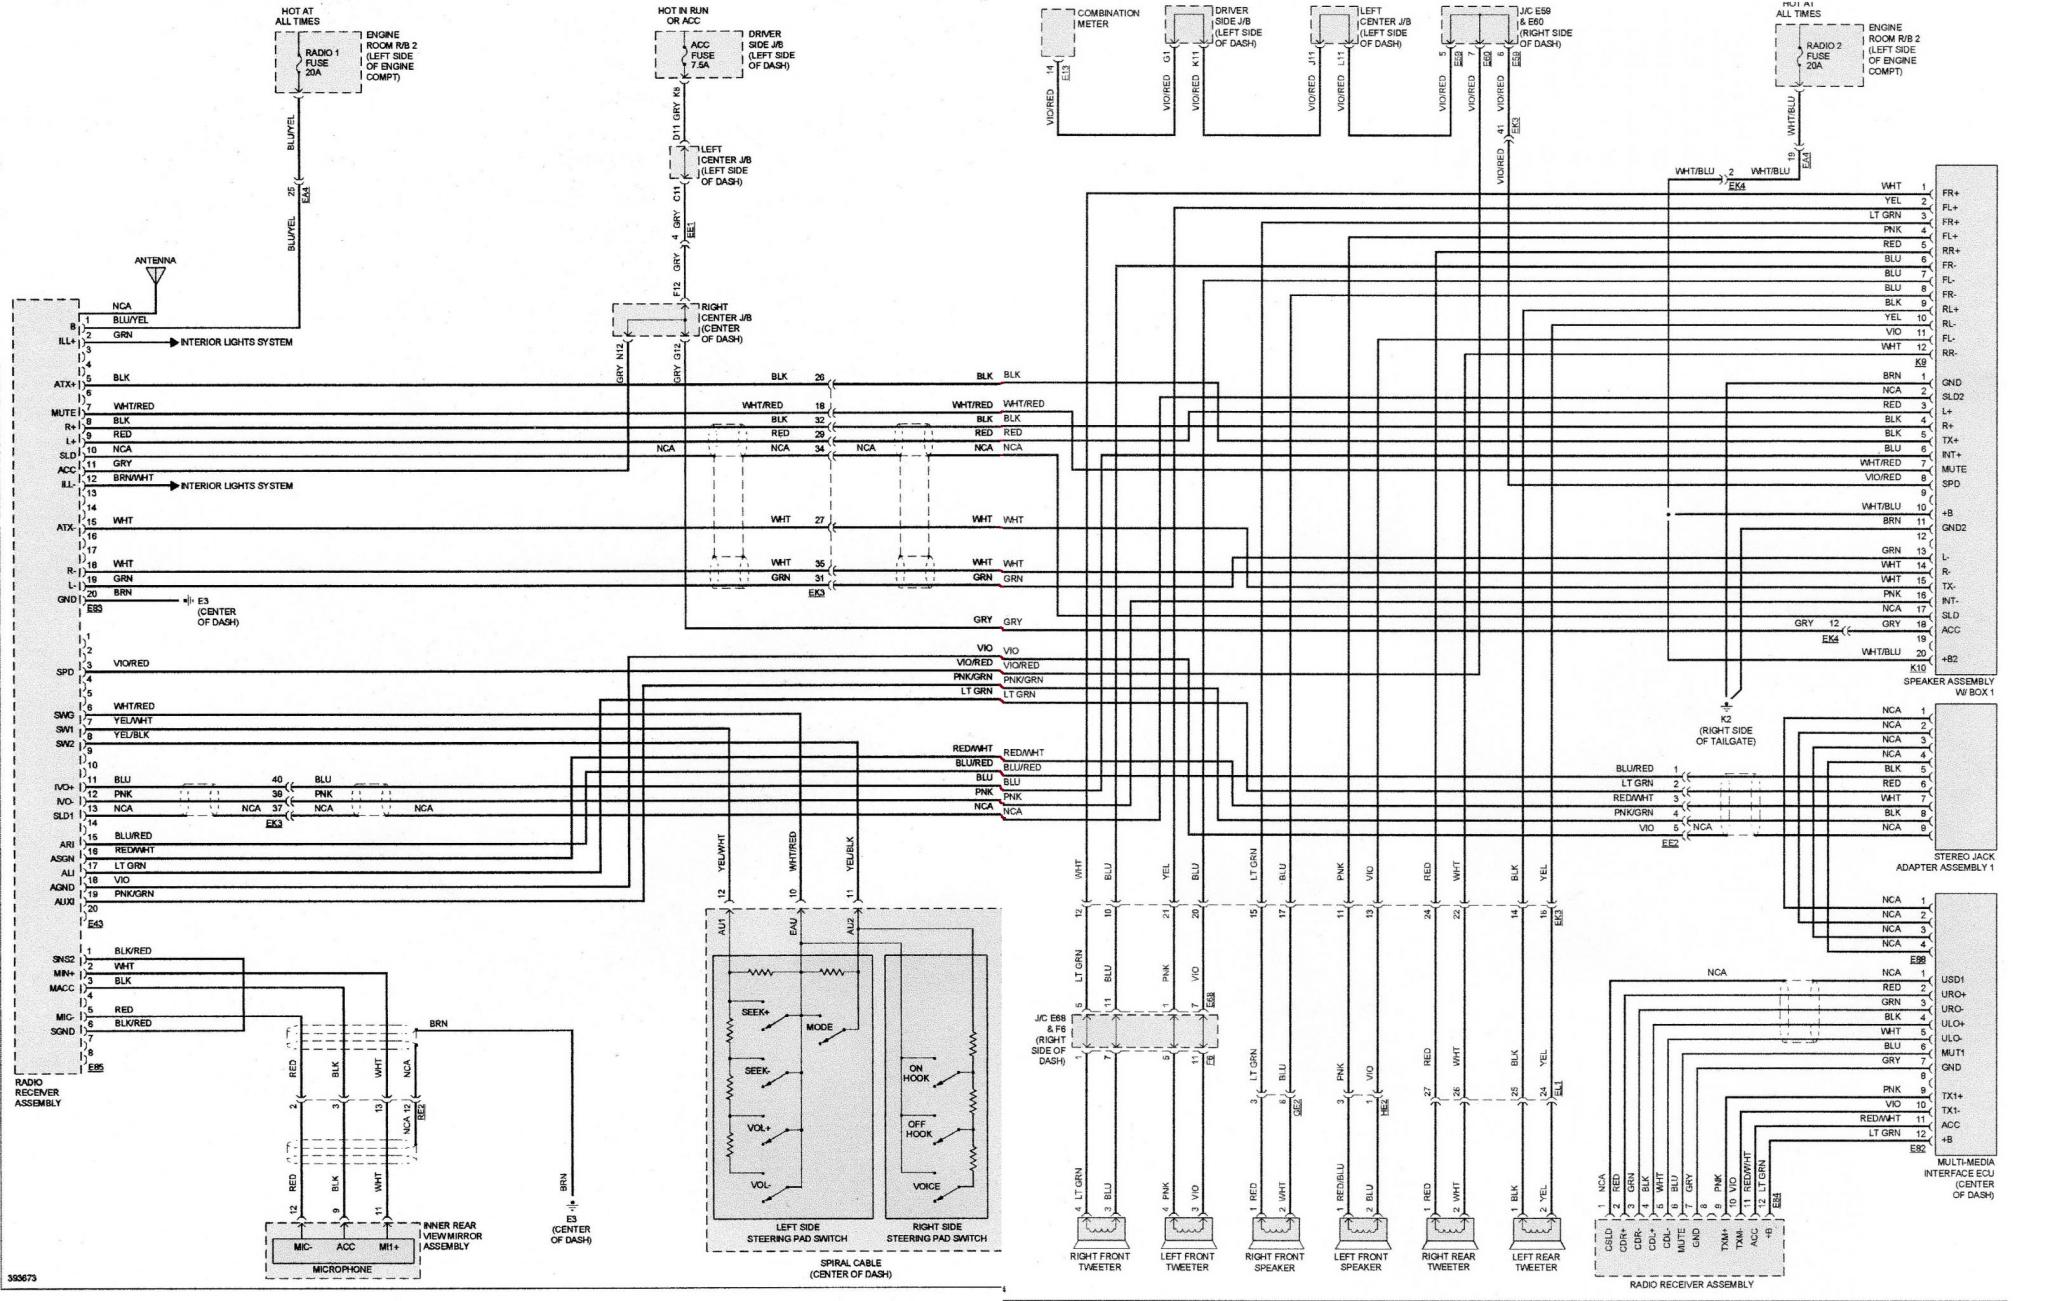 Head unit stereo wiring diagram for '14 - HELP! | Toyota FJ ... Jbl Speaker Wiring Schematic on klipsch speaker wiring, marshall speaker wiring, motorola speaker wiring, pioneer speaker wiring, home speaker wiring, aiwa speaker wiring, pyle speaker wiring, sony speaker wiring, polk audio speaker wiring, kenwood speaker wiring, logitech speaker wiring, peavey speaker wiring, dell speaker wiring, bose speaker wiring, sonos speaker wiring, car speaker wiring, fender speaker wiring, kicker speaker wiring,